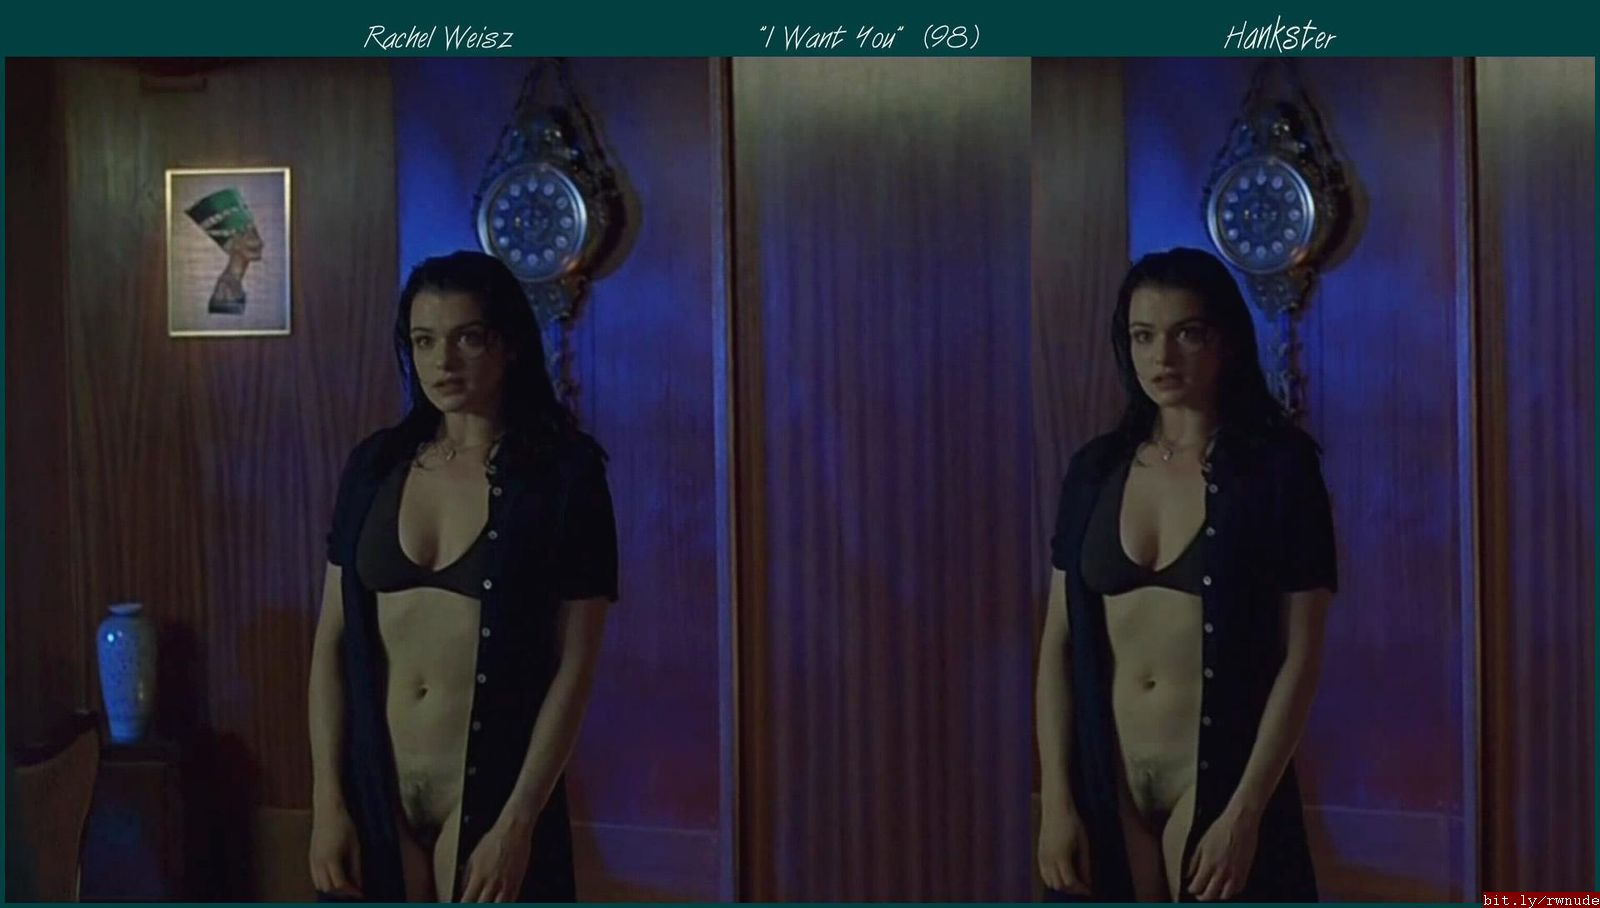 Rachel Hannah Weisz Nude